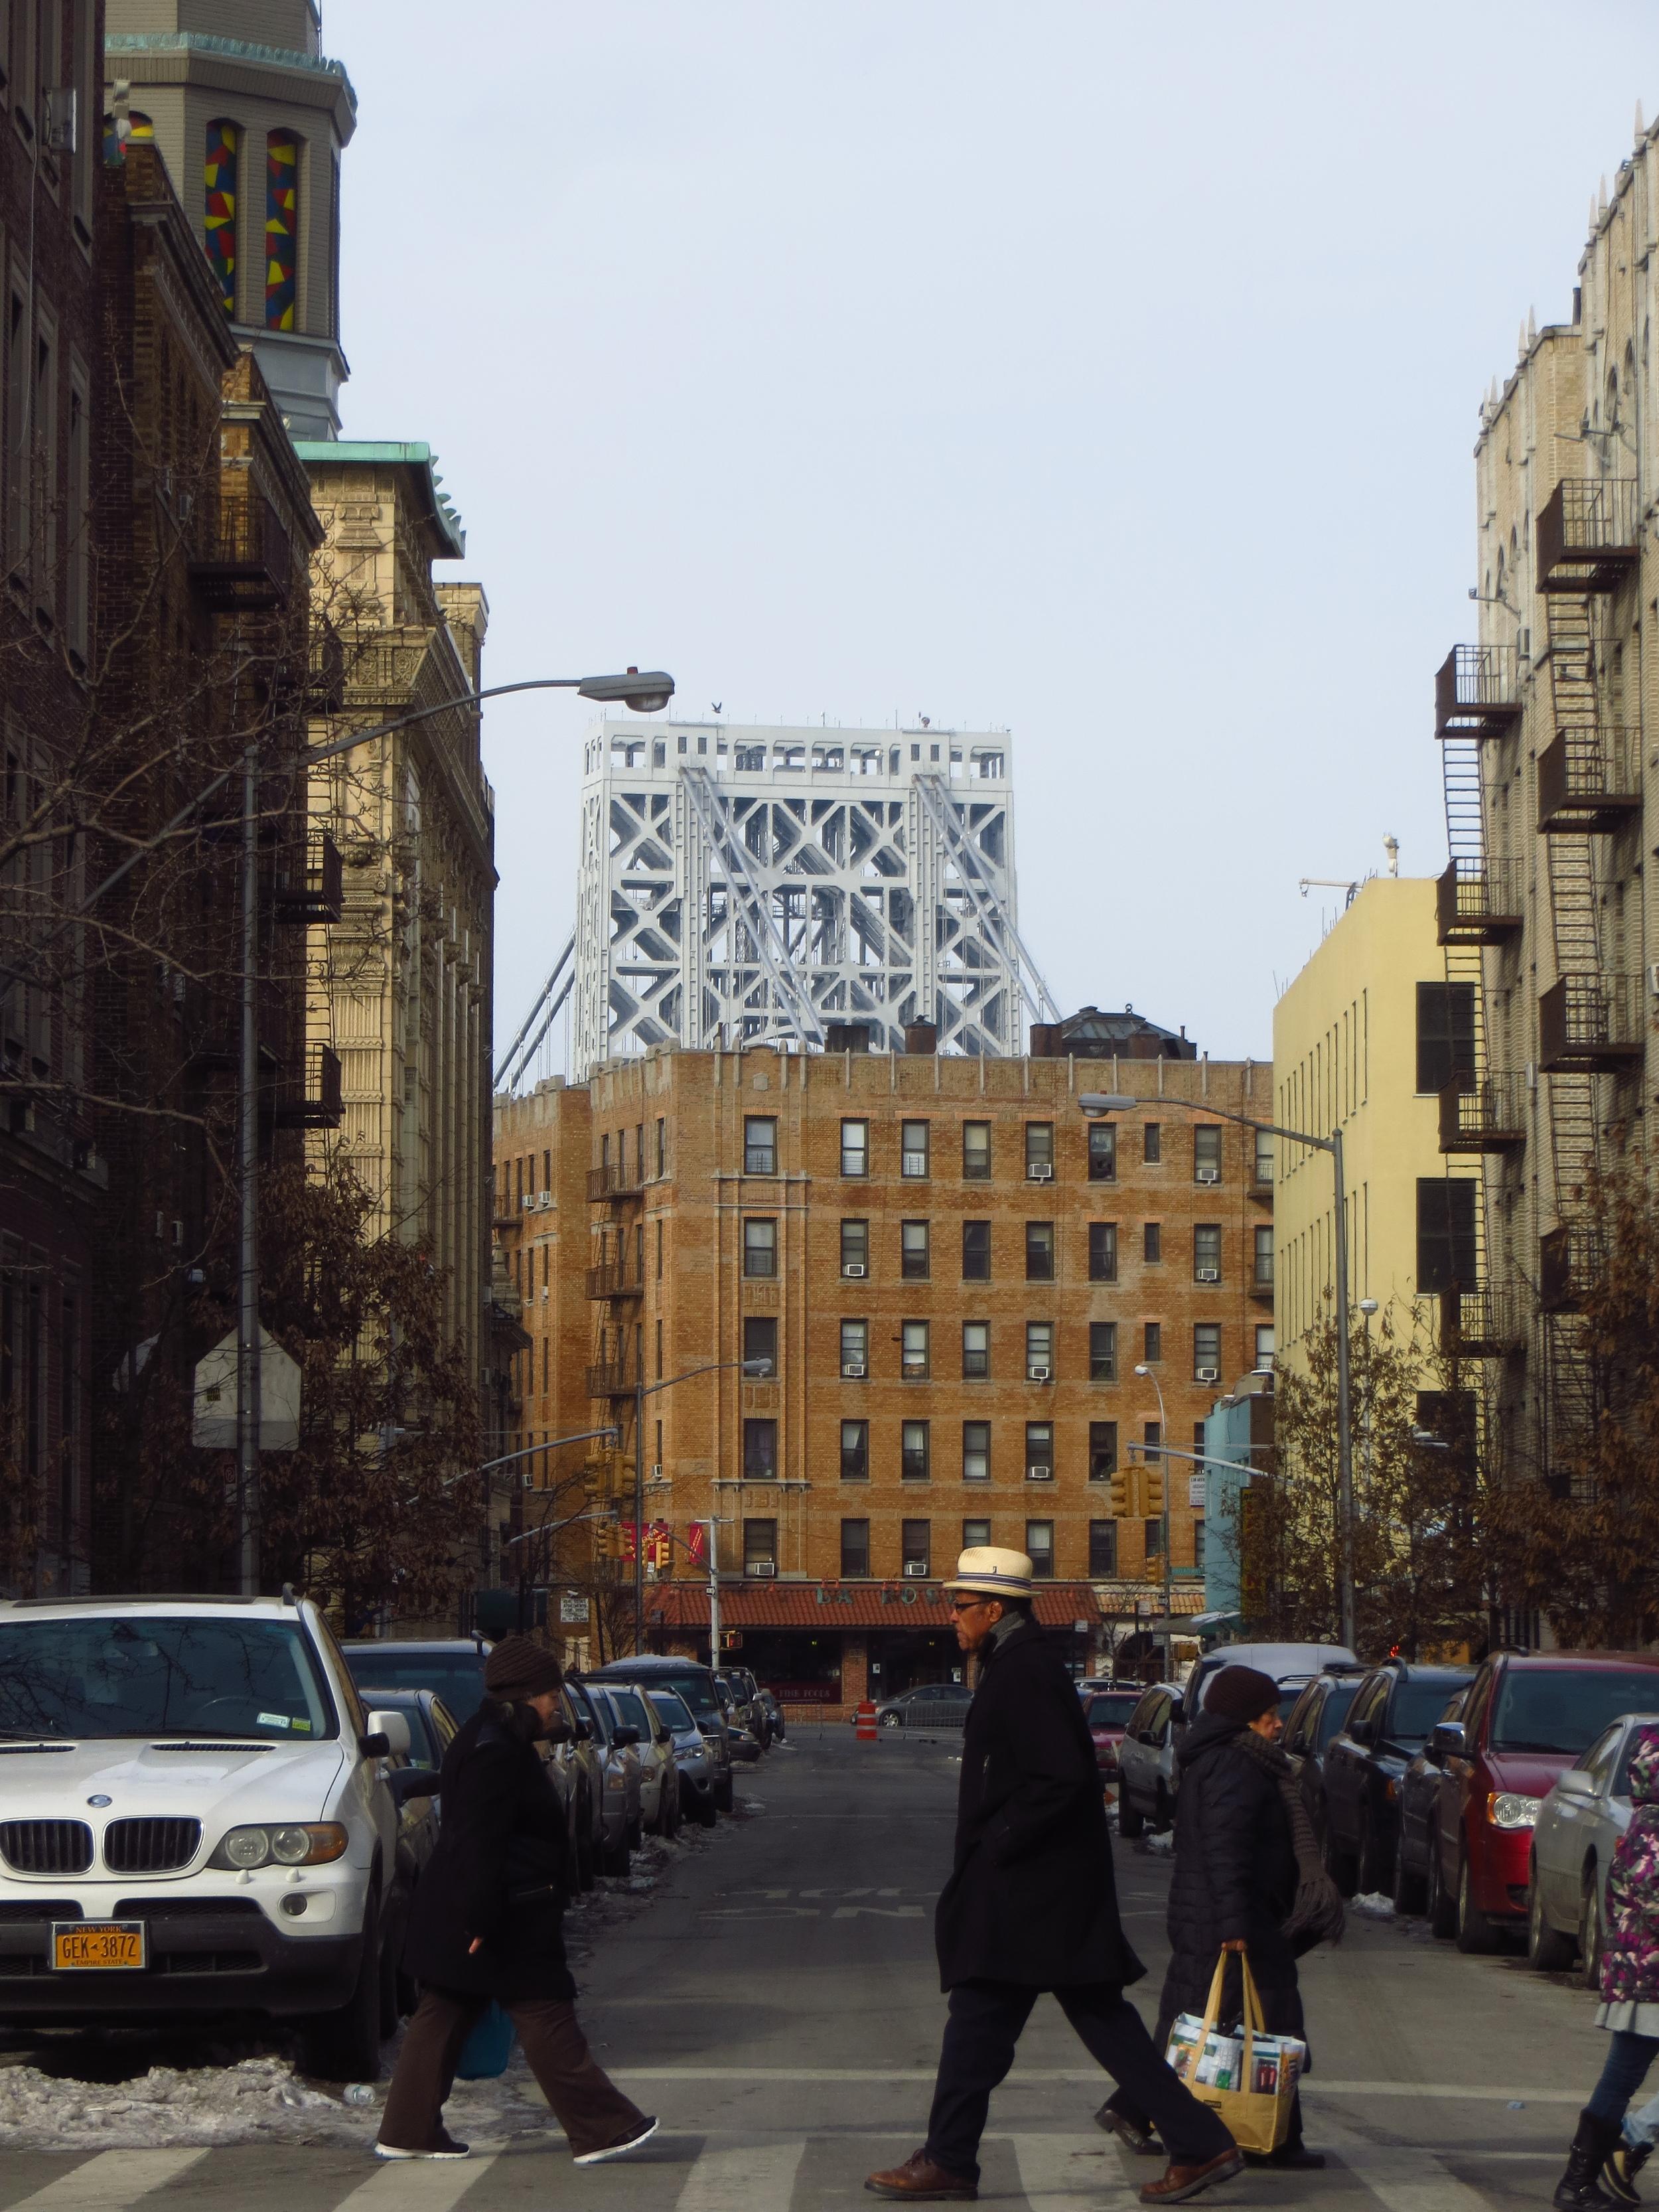 GW Bridge and crosswalk